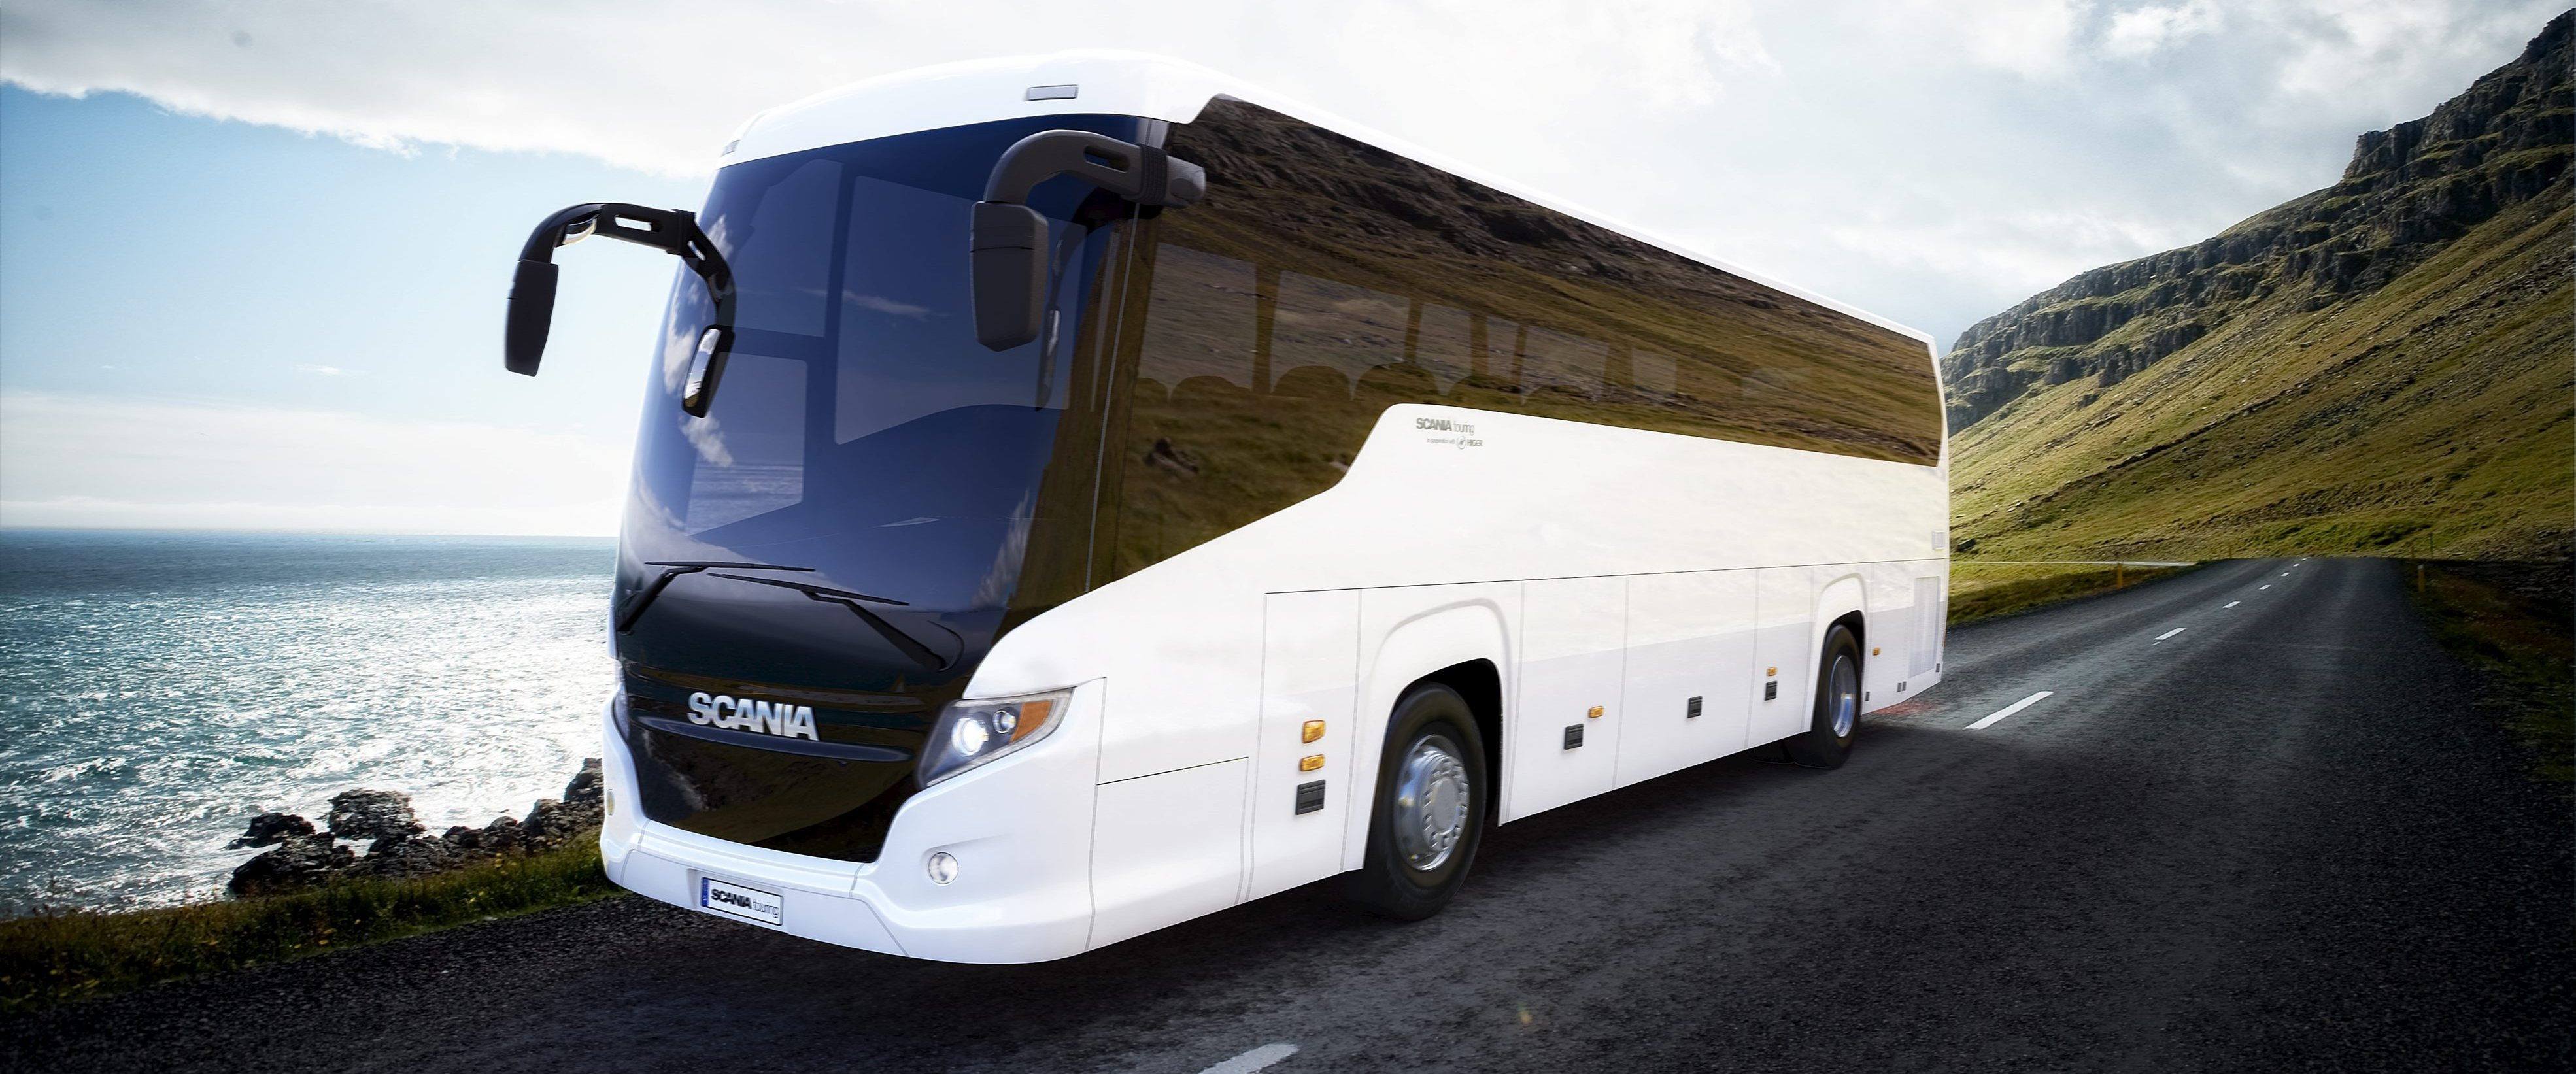 Autobusová preprava - hutar.sk